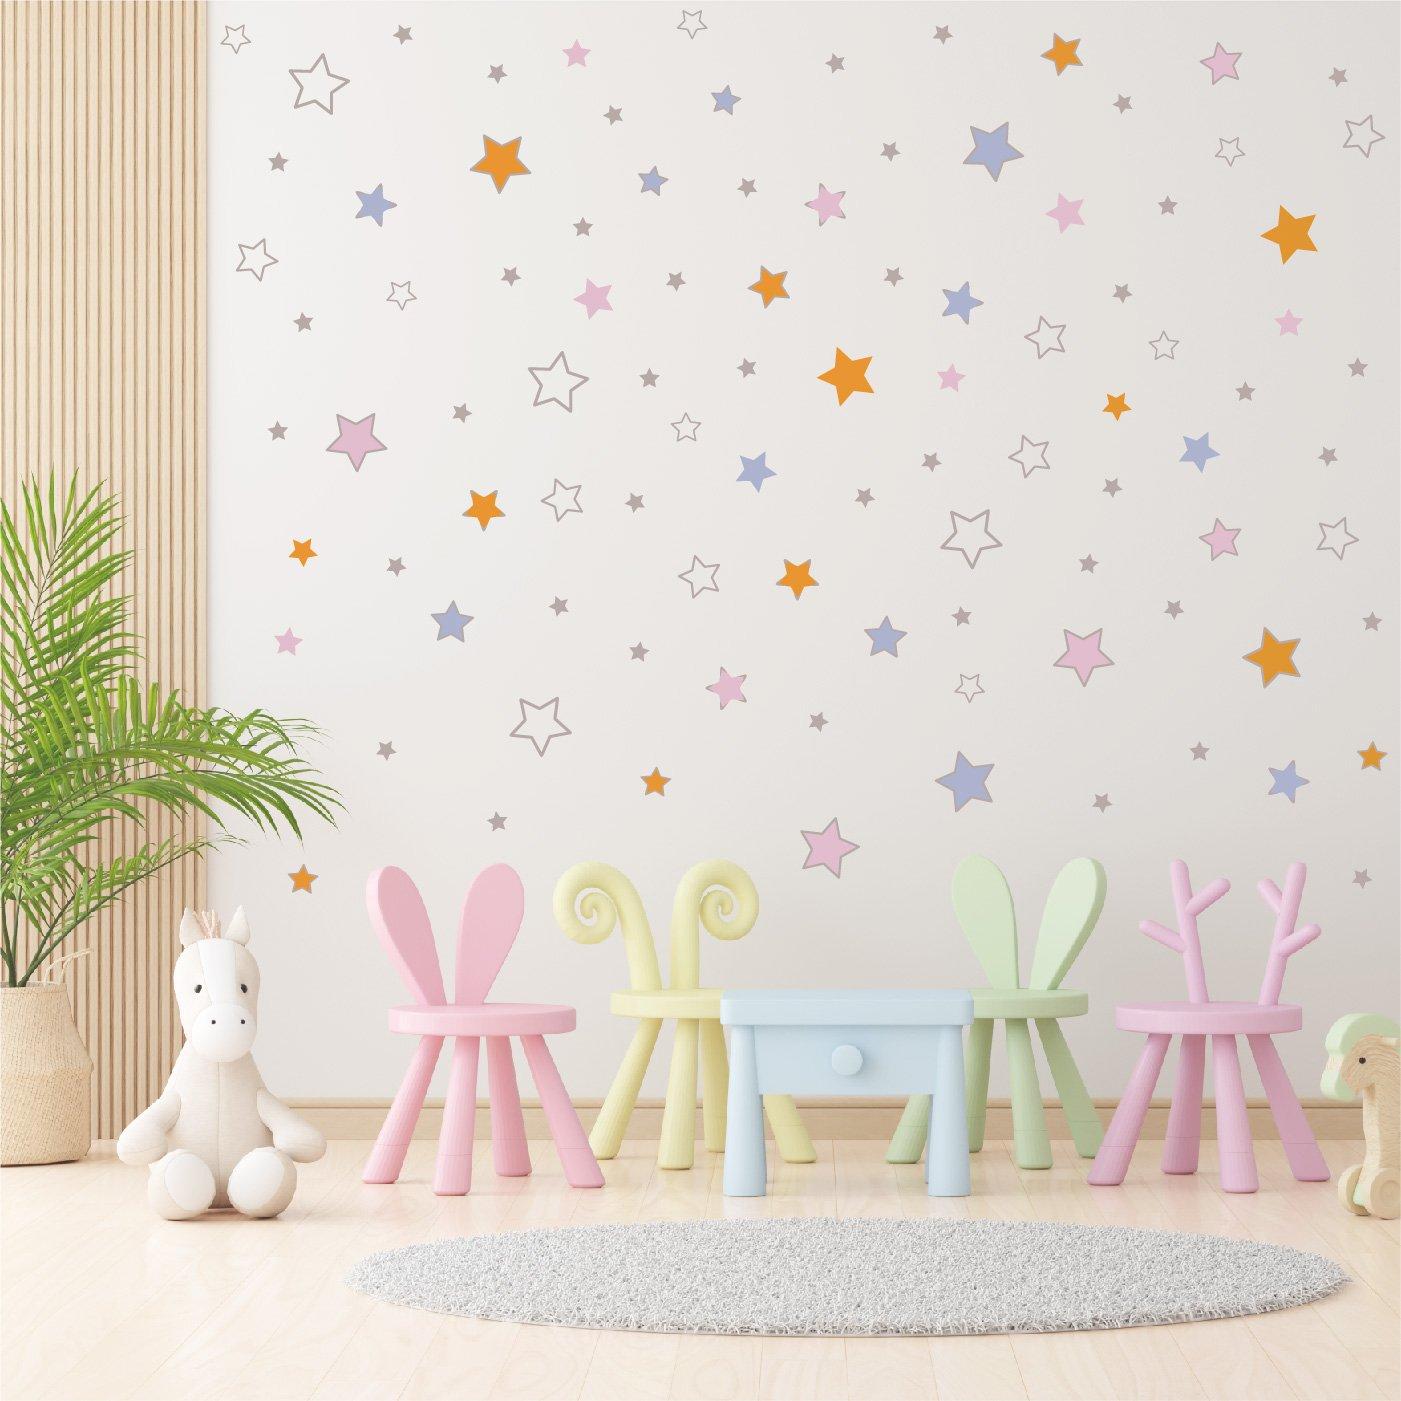 Wall stickers - Pink stars